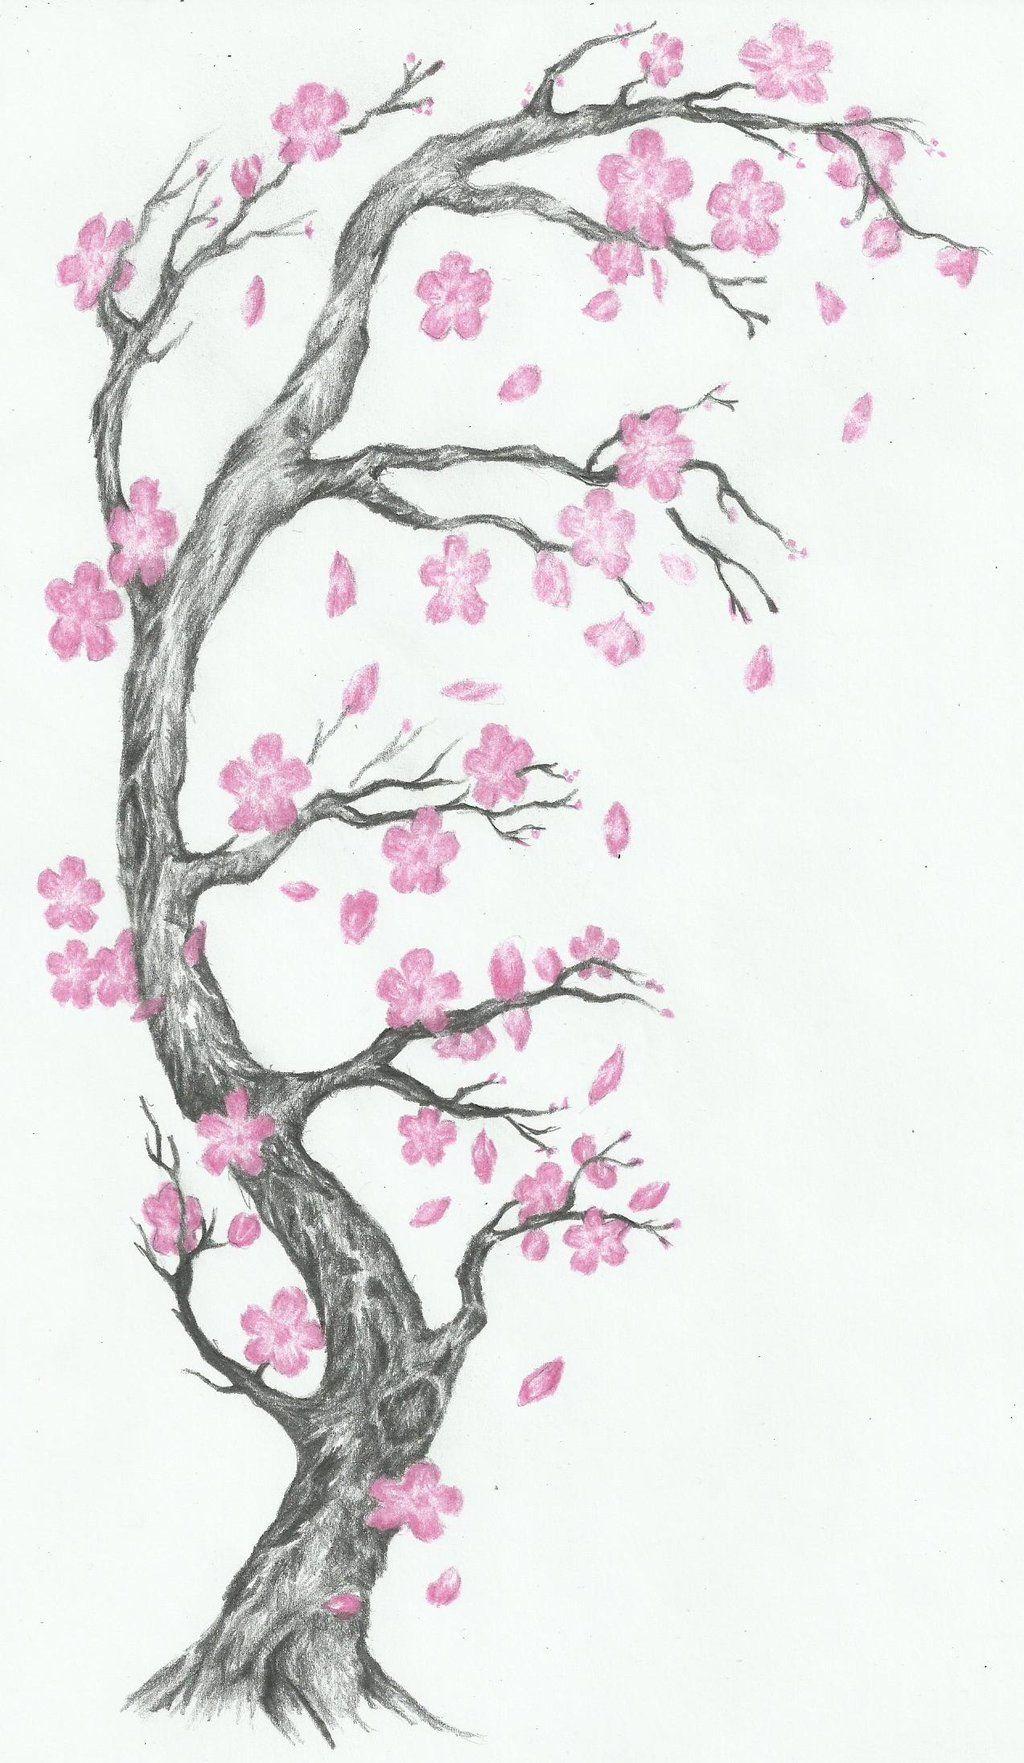 cherry blossom tattoo - Google Search | Tattoos - Cherry ...